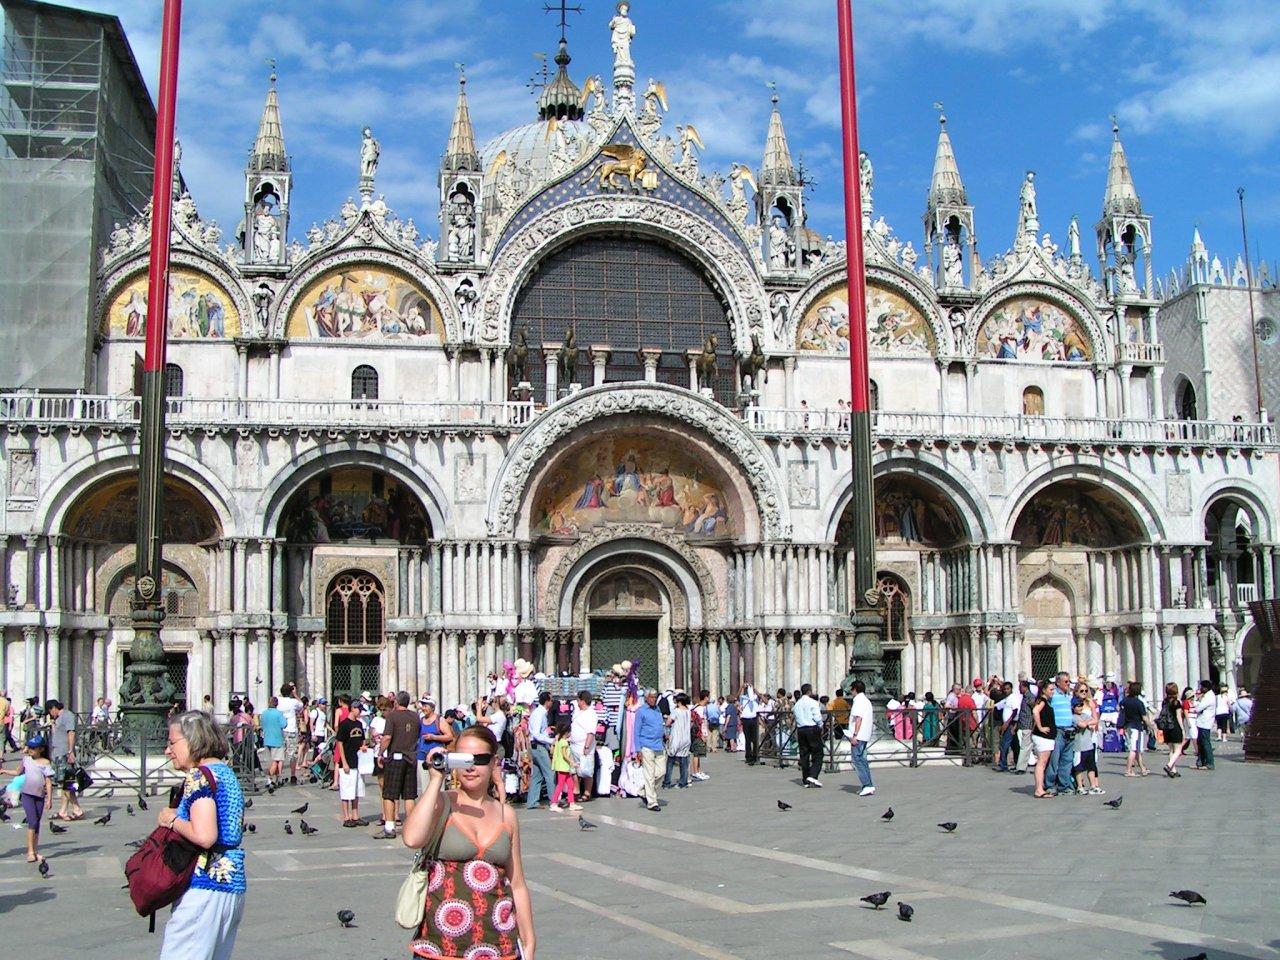 Piazza San Marco with Basilica di San Marco, Venice, Italy